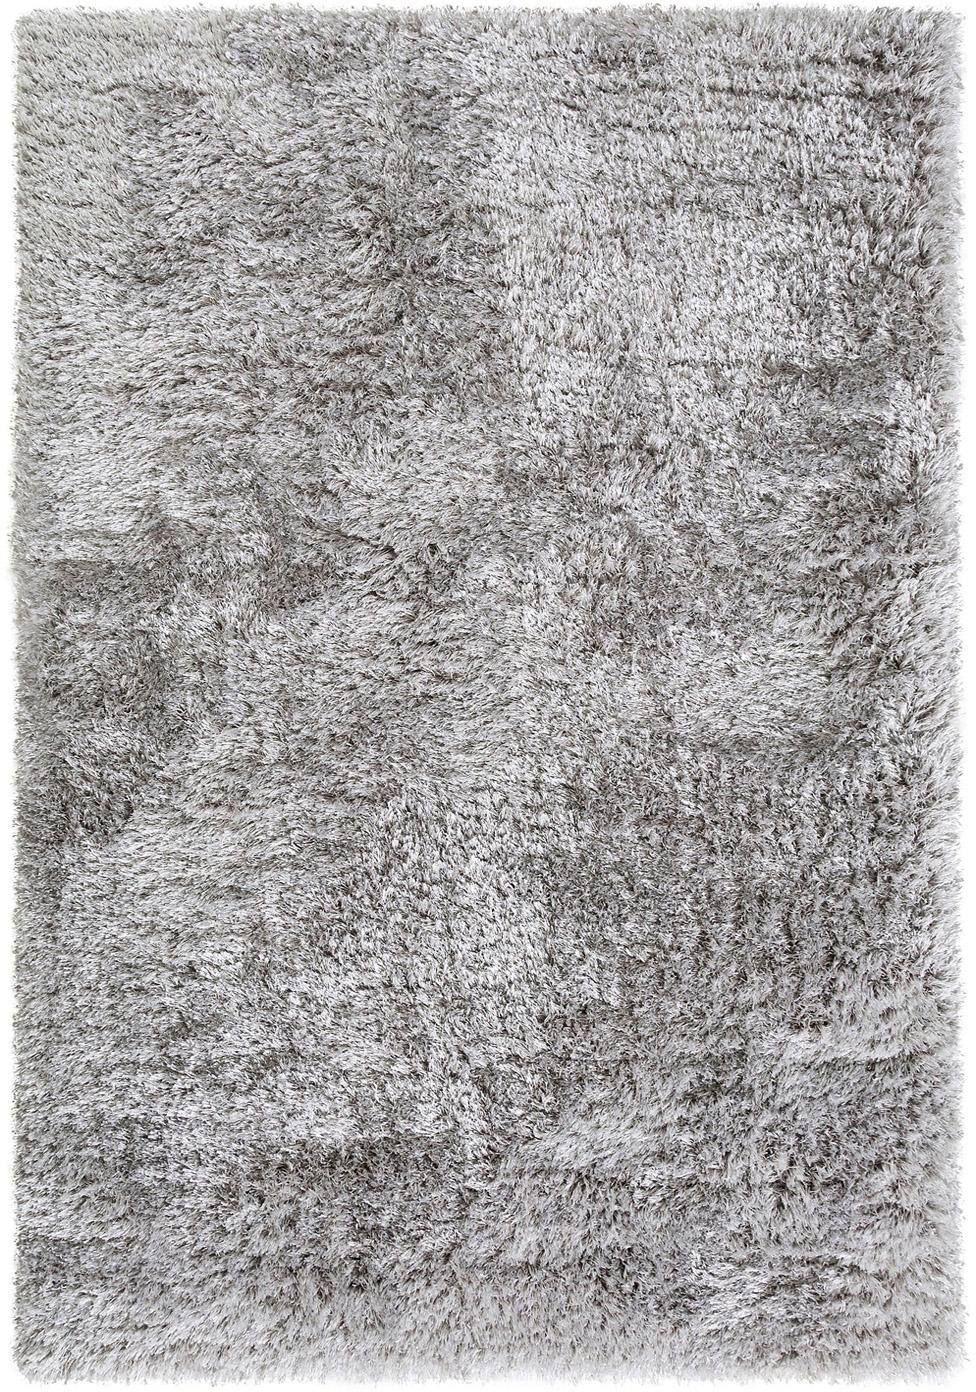 Glänzender Hochflor-Teppich Lea in Hellgrau, Flor: 50% Polyester, 50% Polypr, Grau, B 140 x L 200 cm (Größe S)